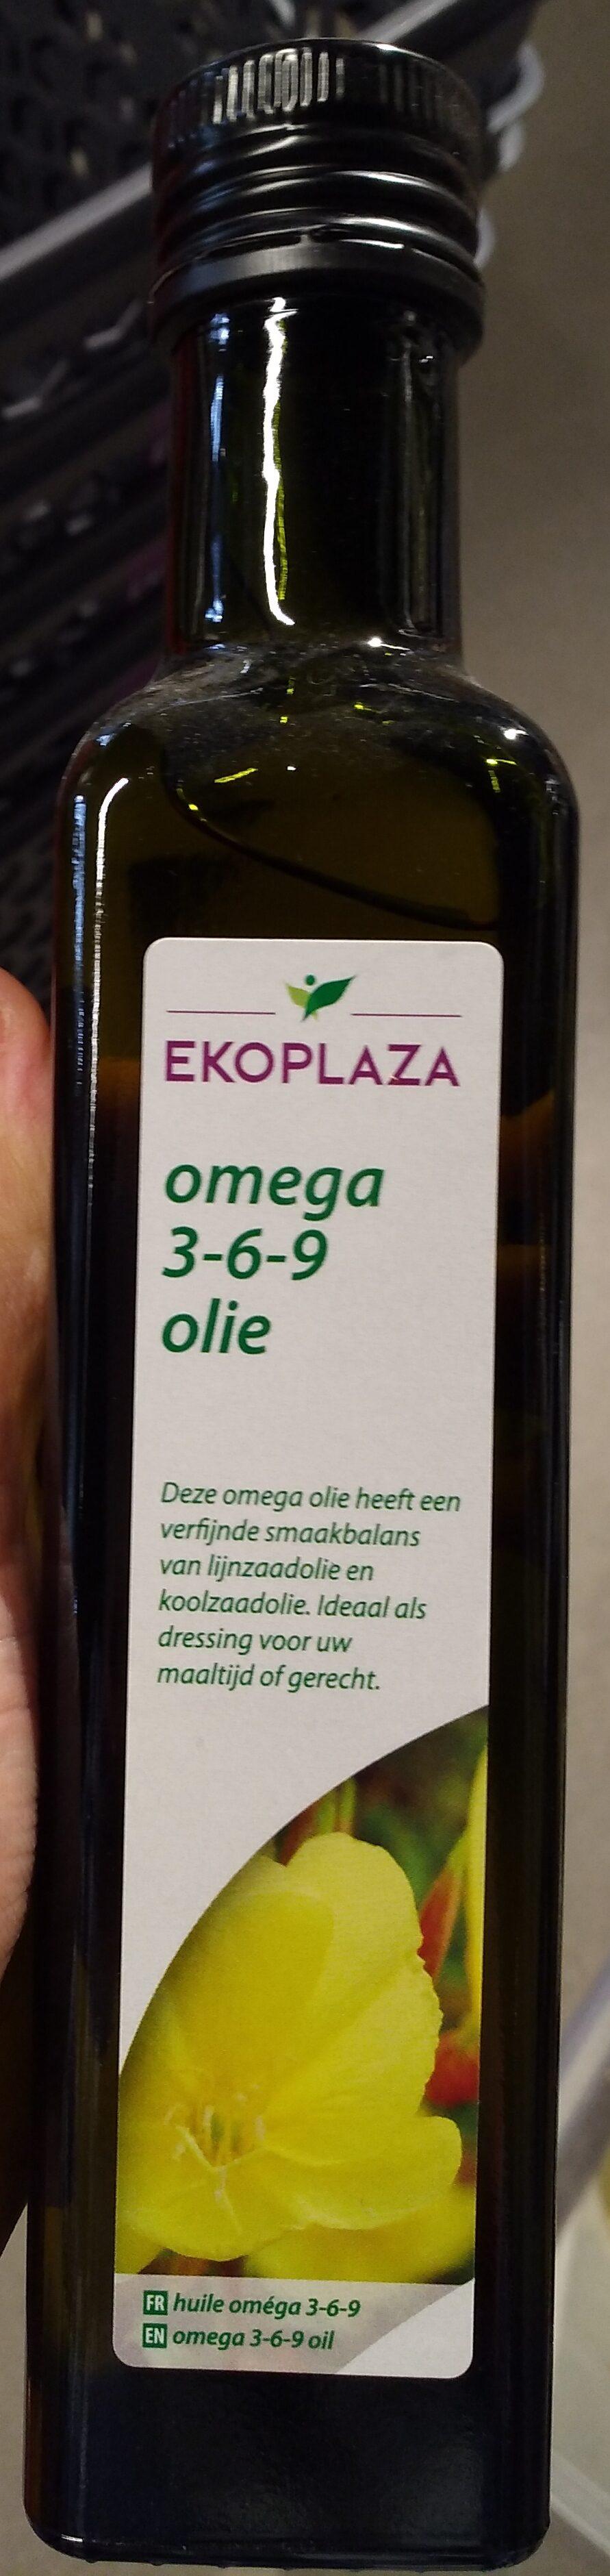 Omega 3-6-9 olie - Product